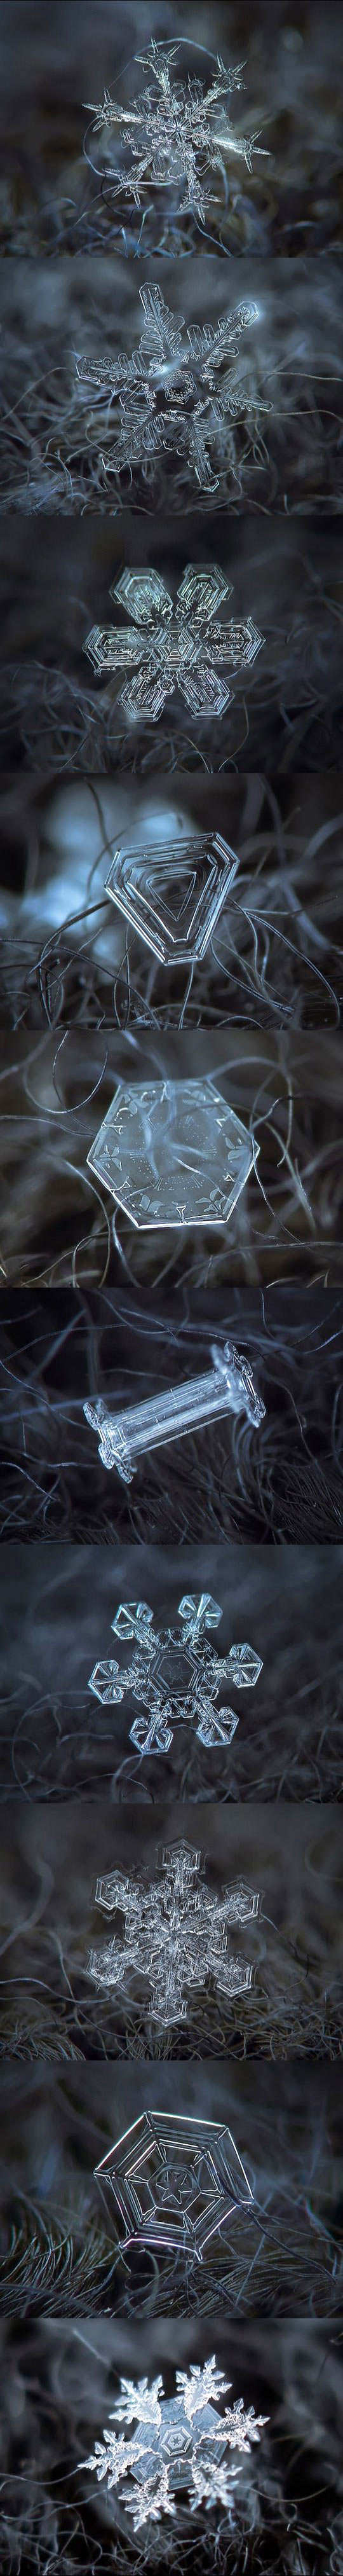 Micro-Photography Of Tiny Snowflakes